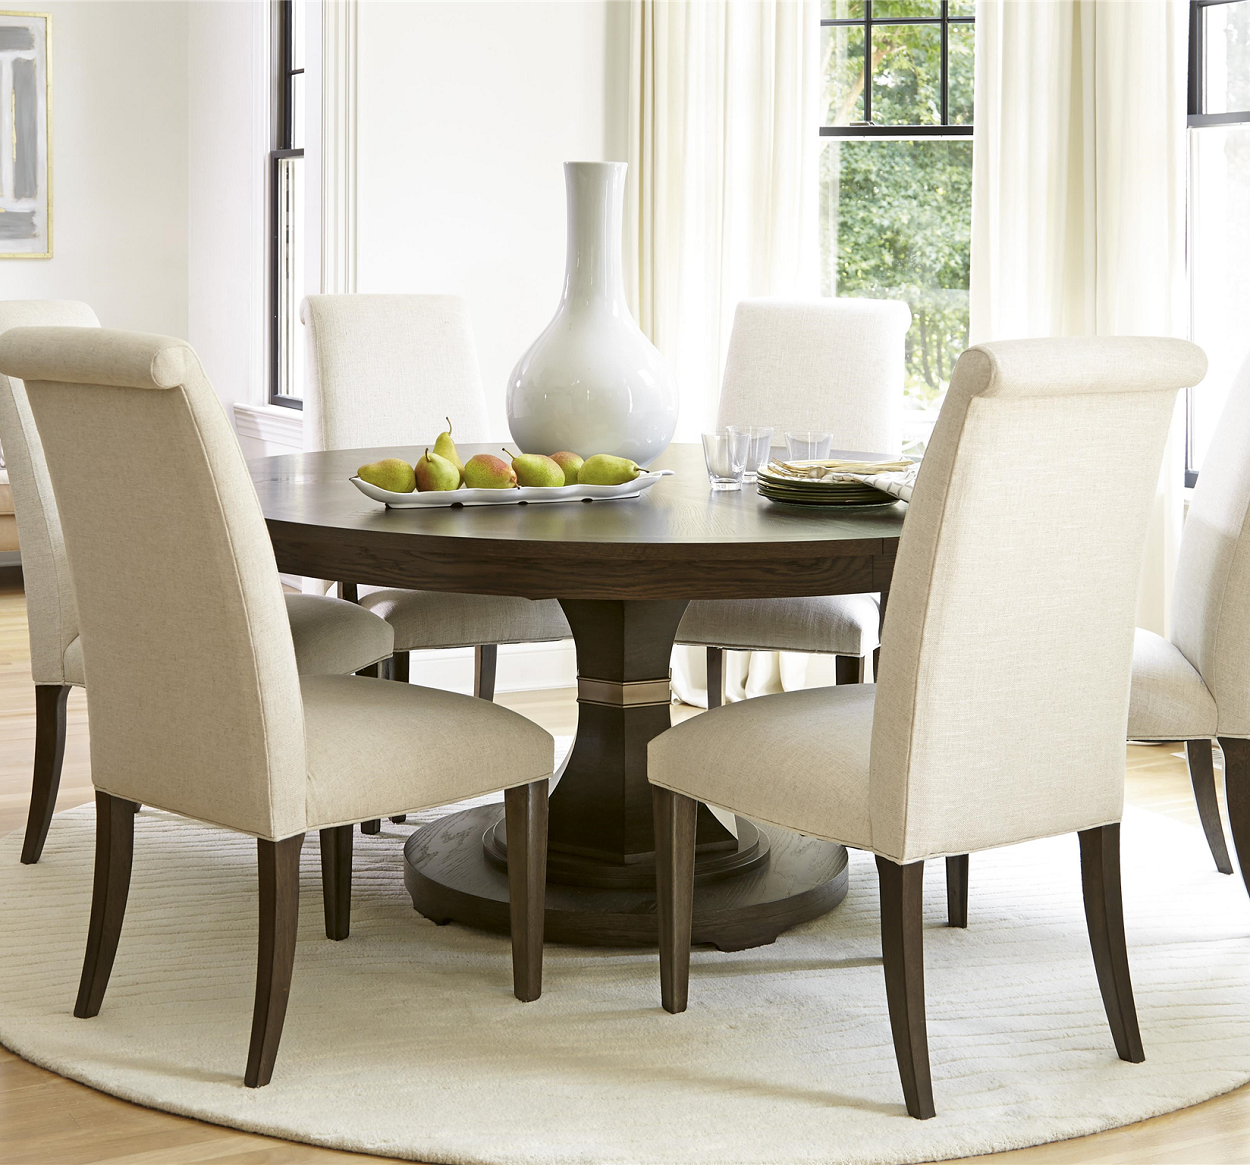 California rustic oak piece round dining room set tables